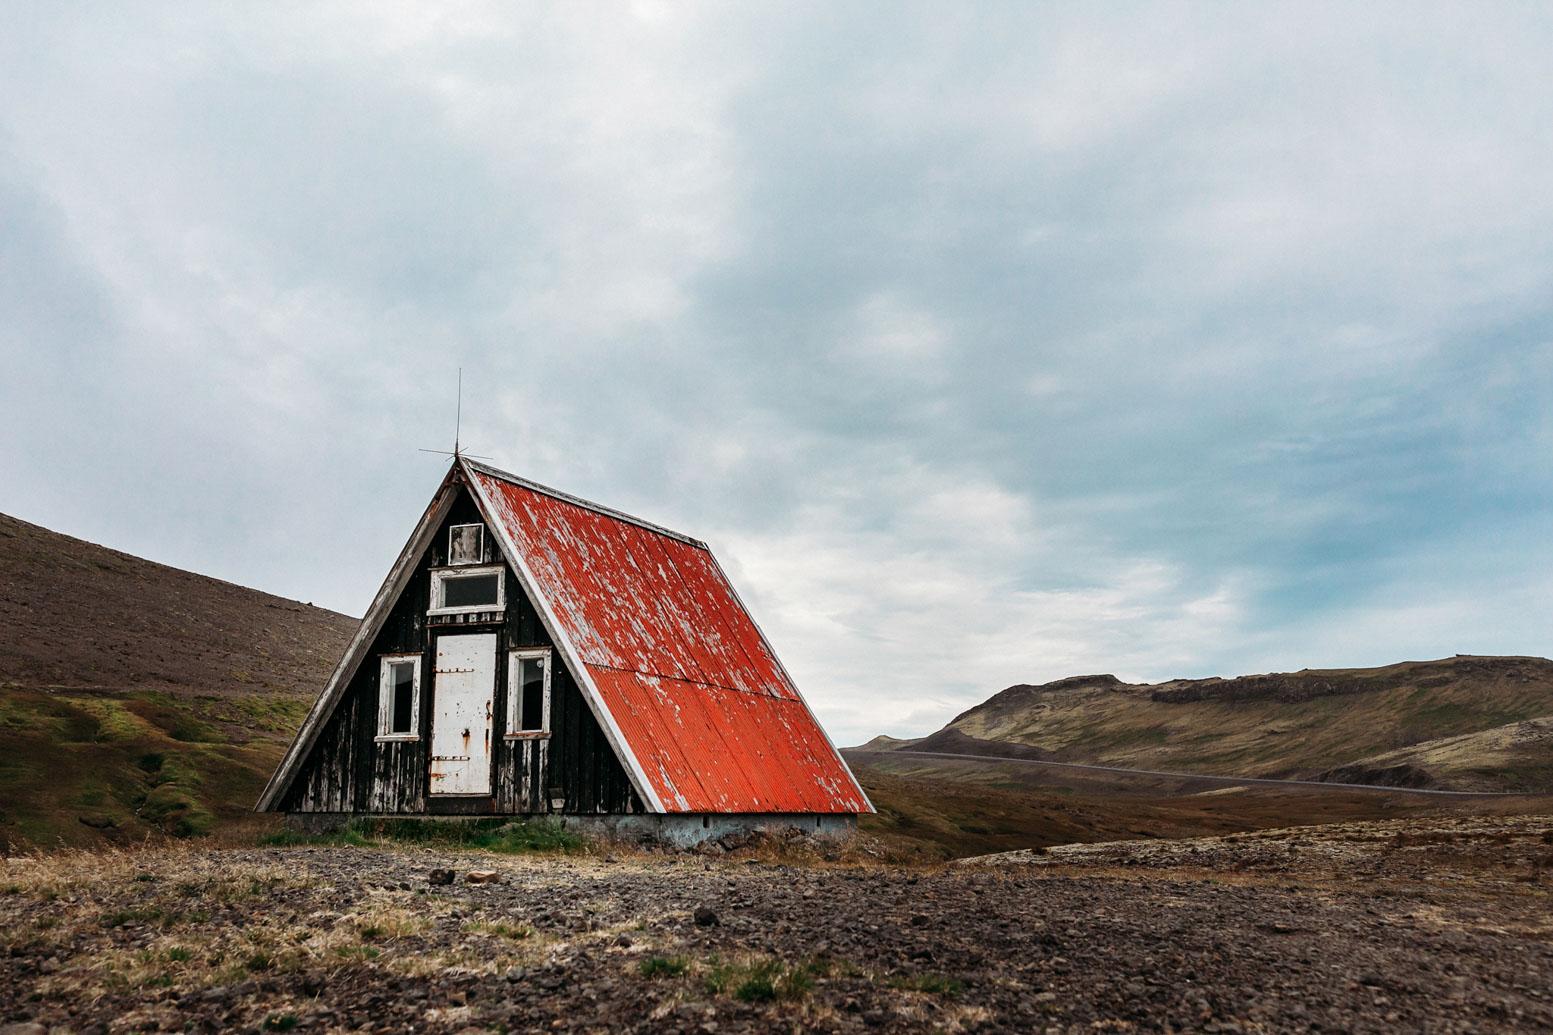 Abandoned in Iceland. Snæfellsnes Peninsula, Iceland